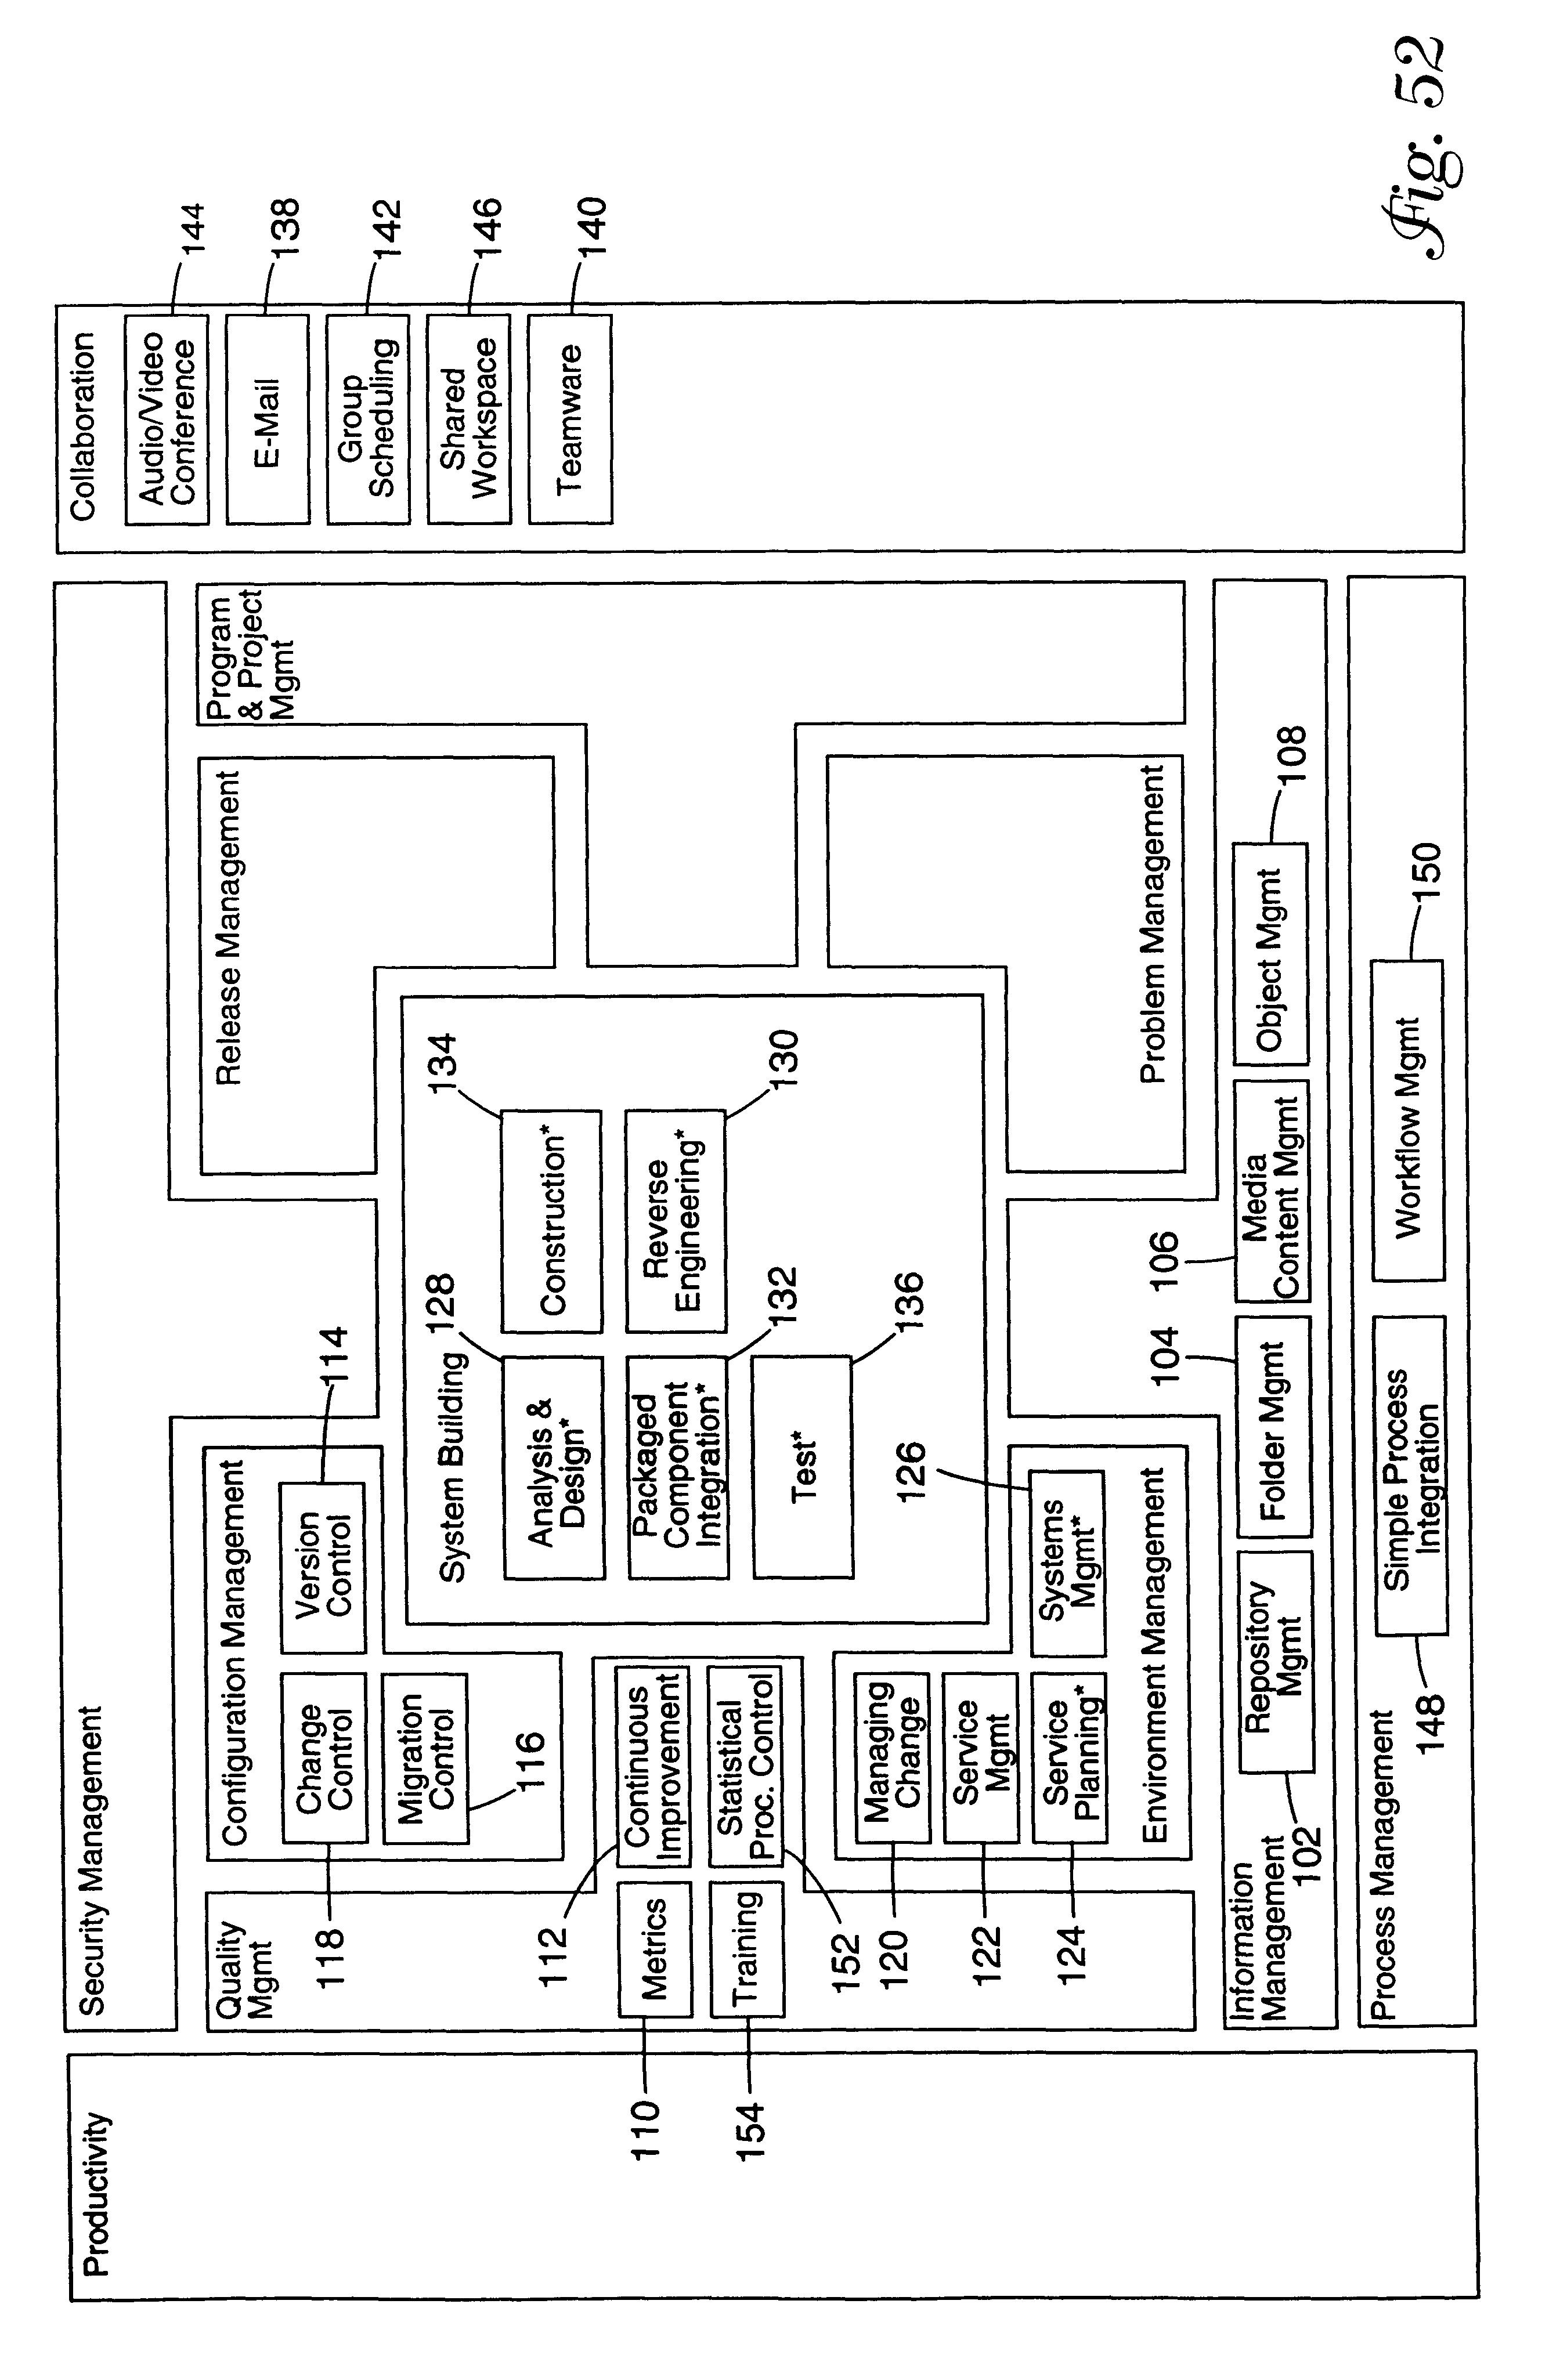 Patent Us 6519571 B1 Mechanical Electrical Plan Vignette Images